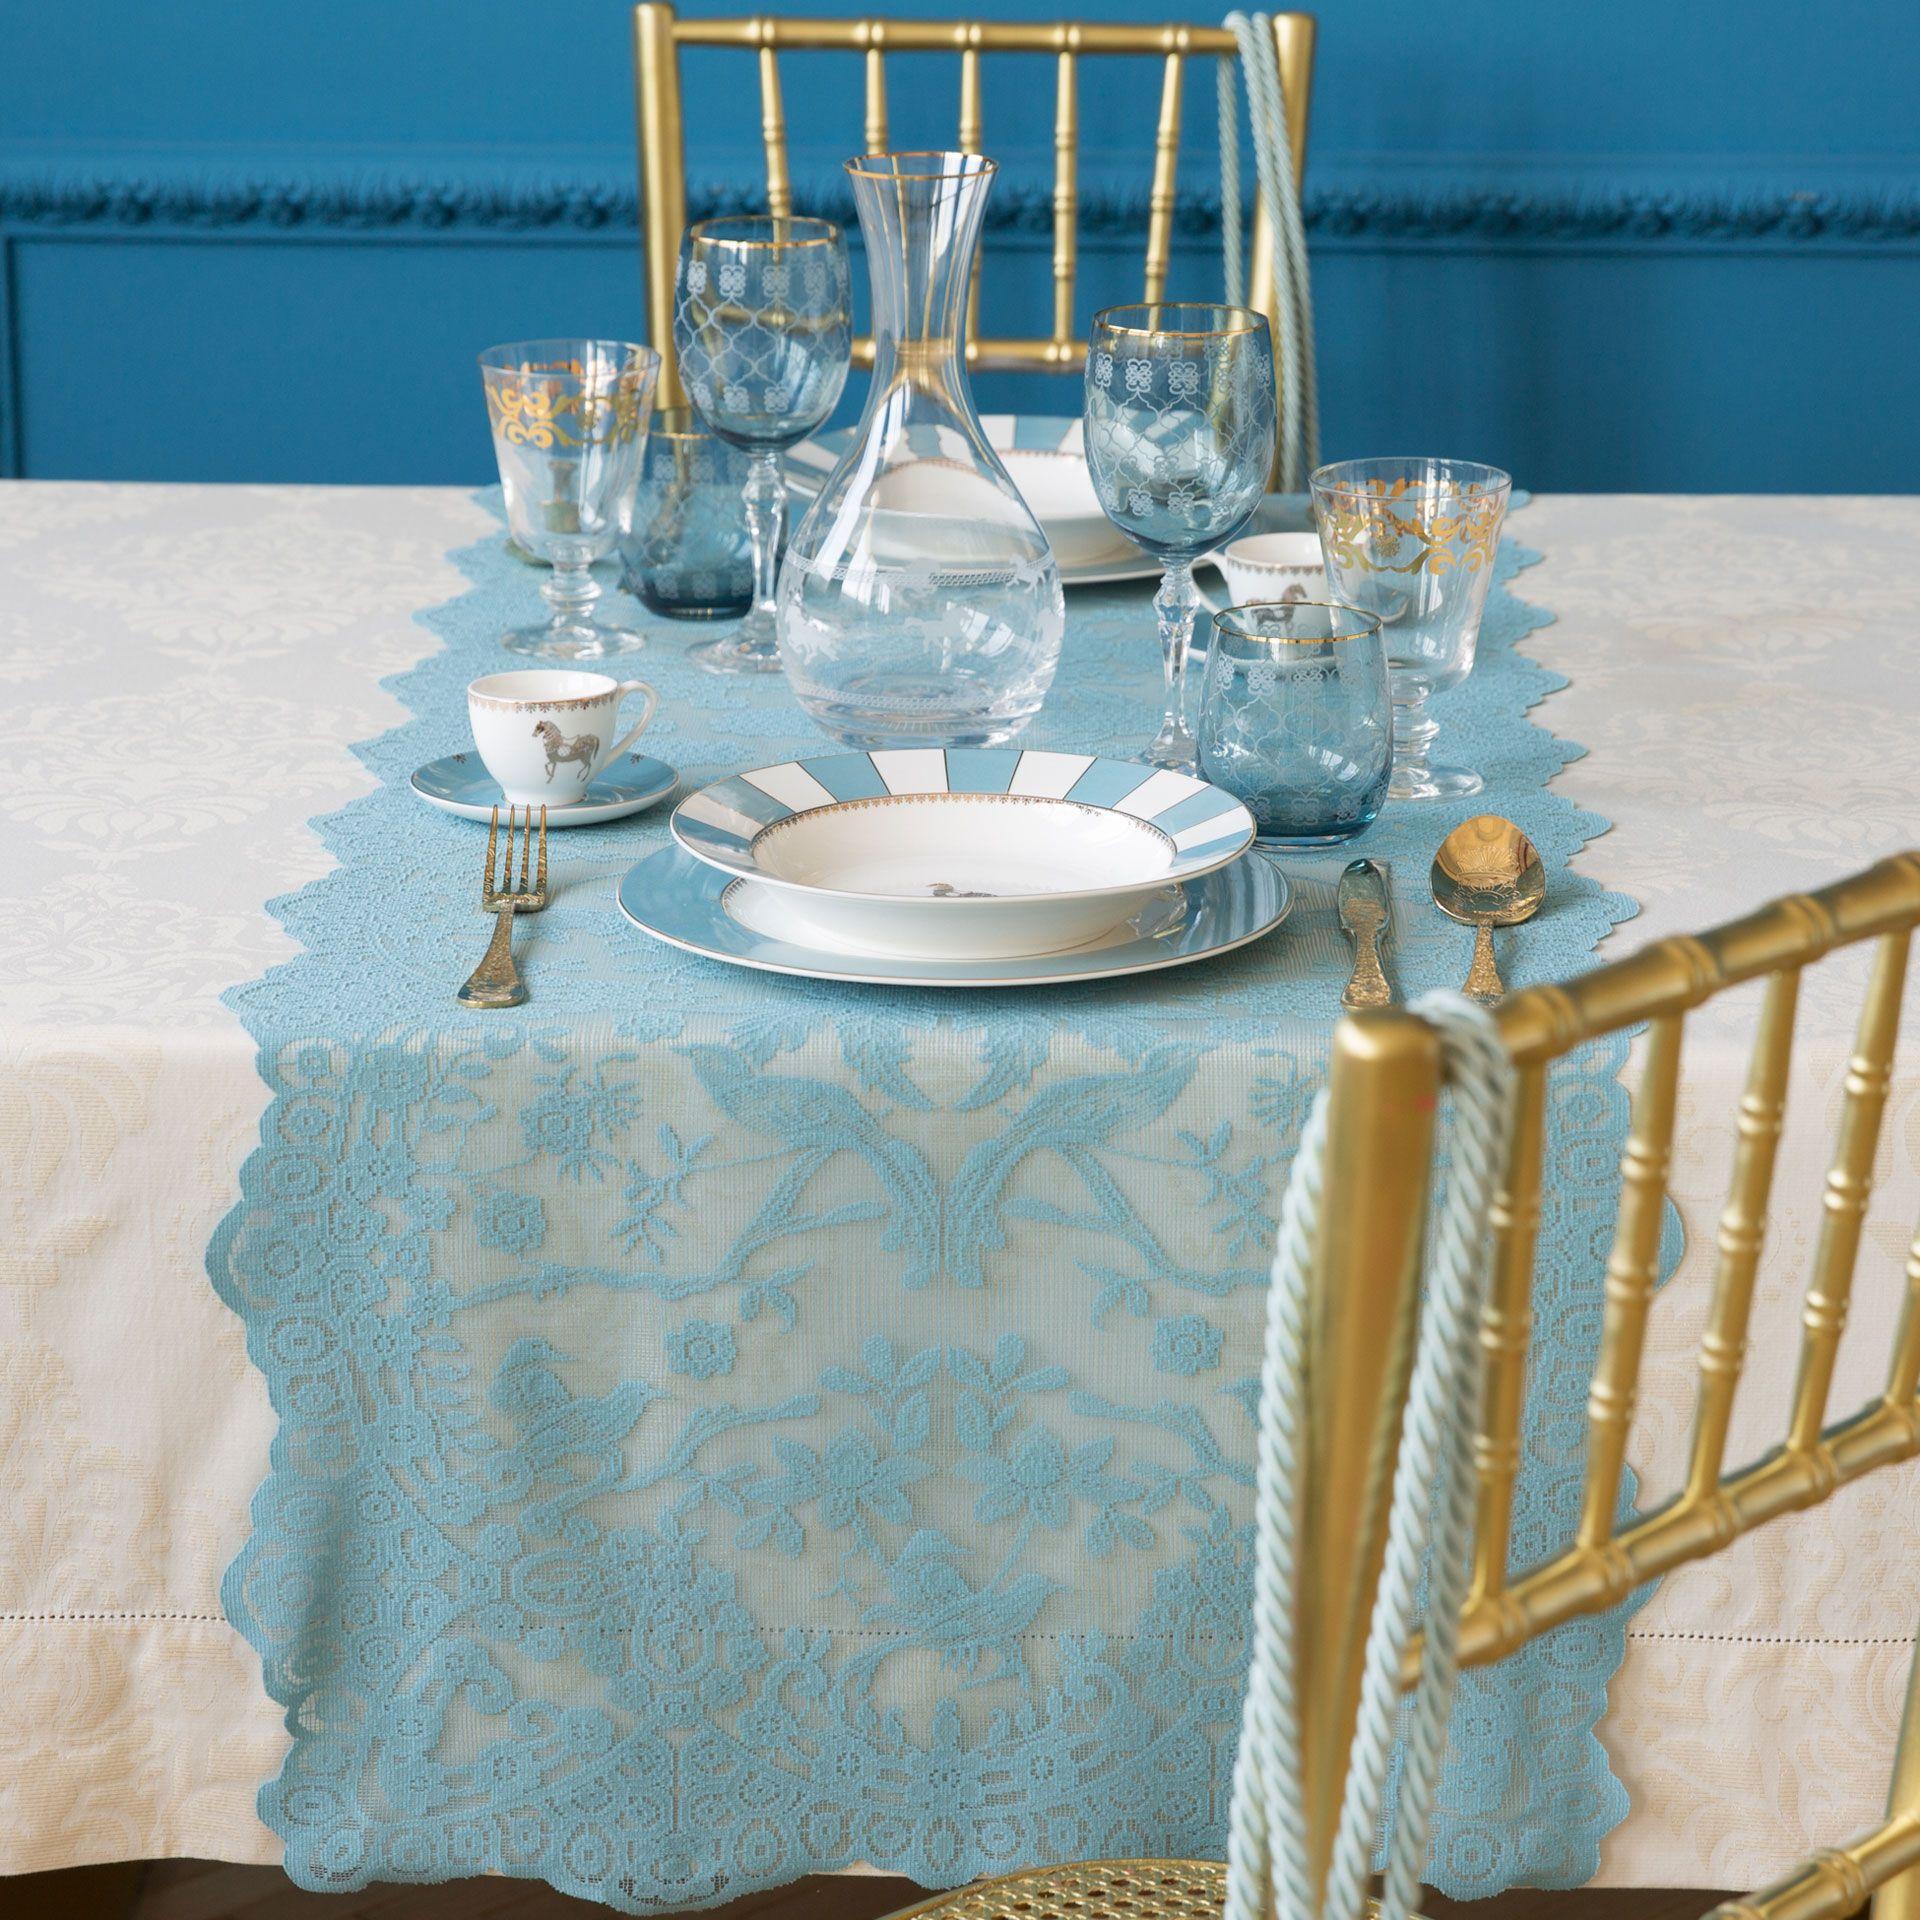 Zara home to open in toronto - Dark Blue Crochet Table Runner Table Runners Tableware Zara Home T Rkiye Turkey